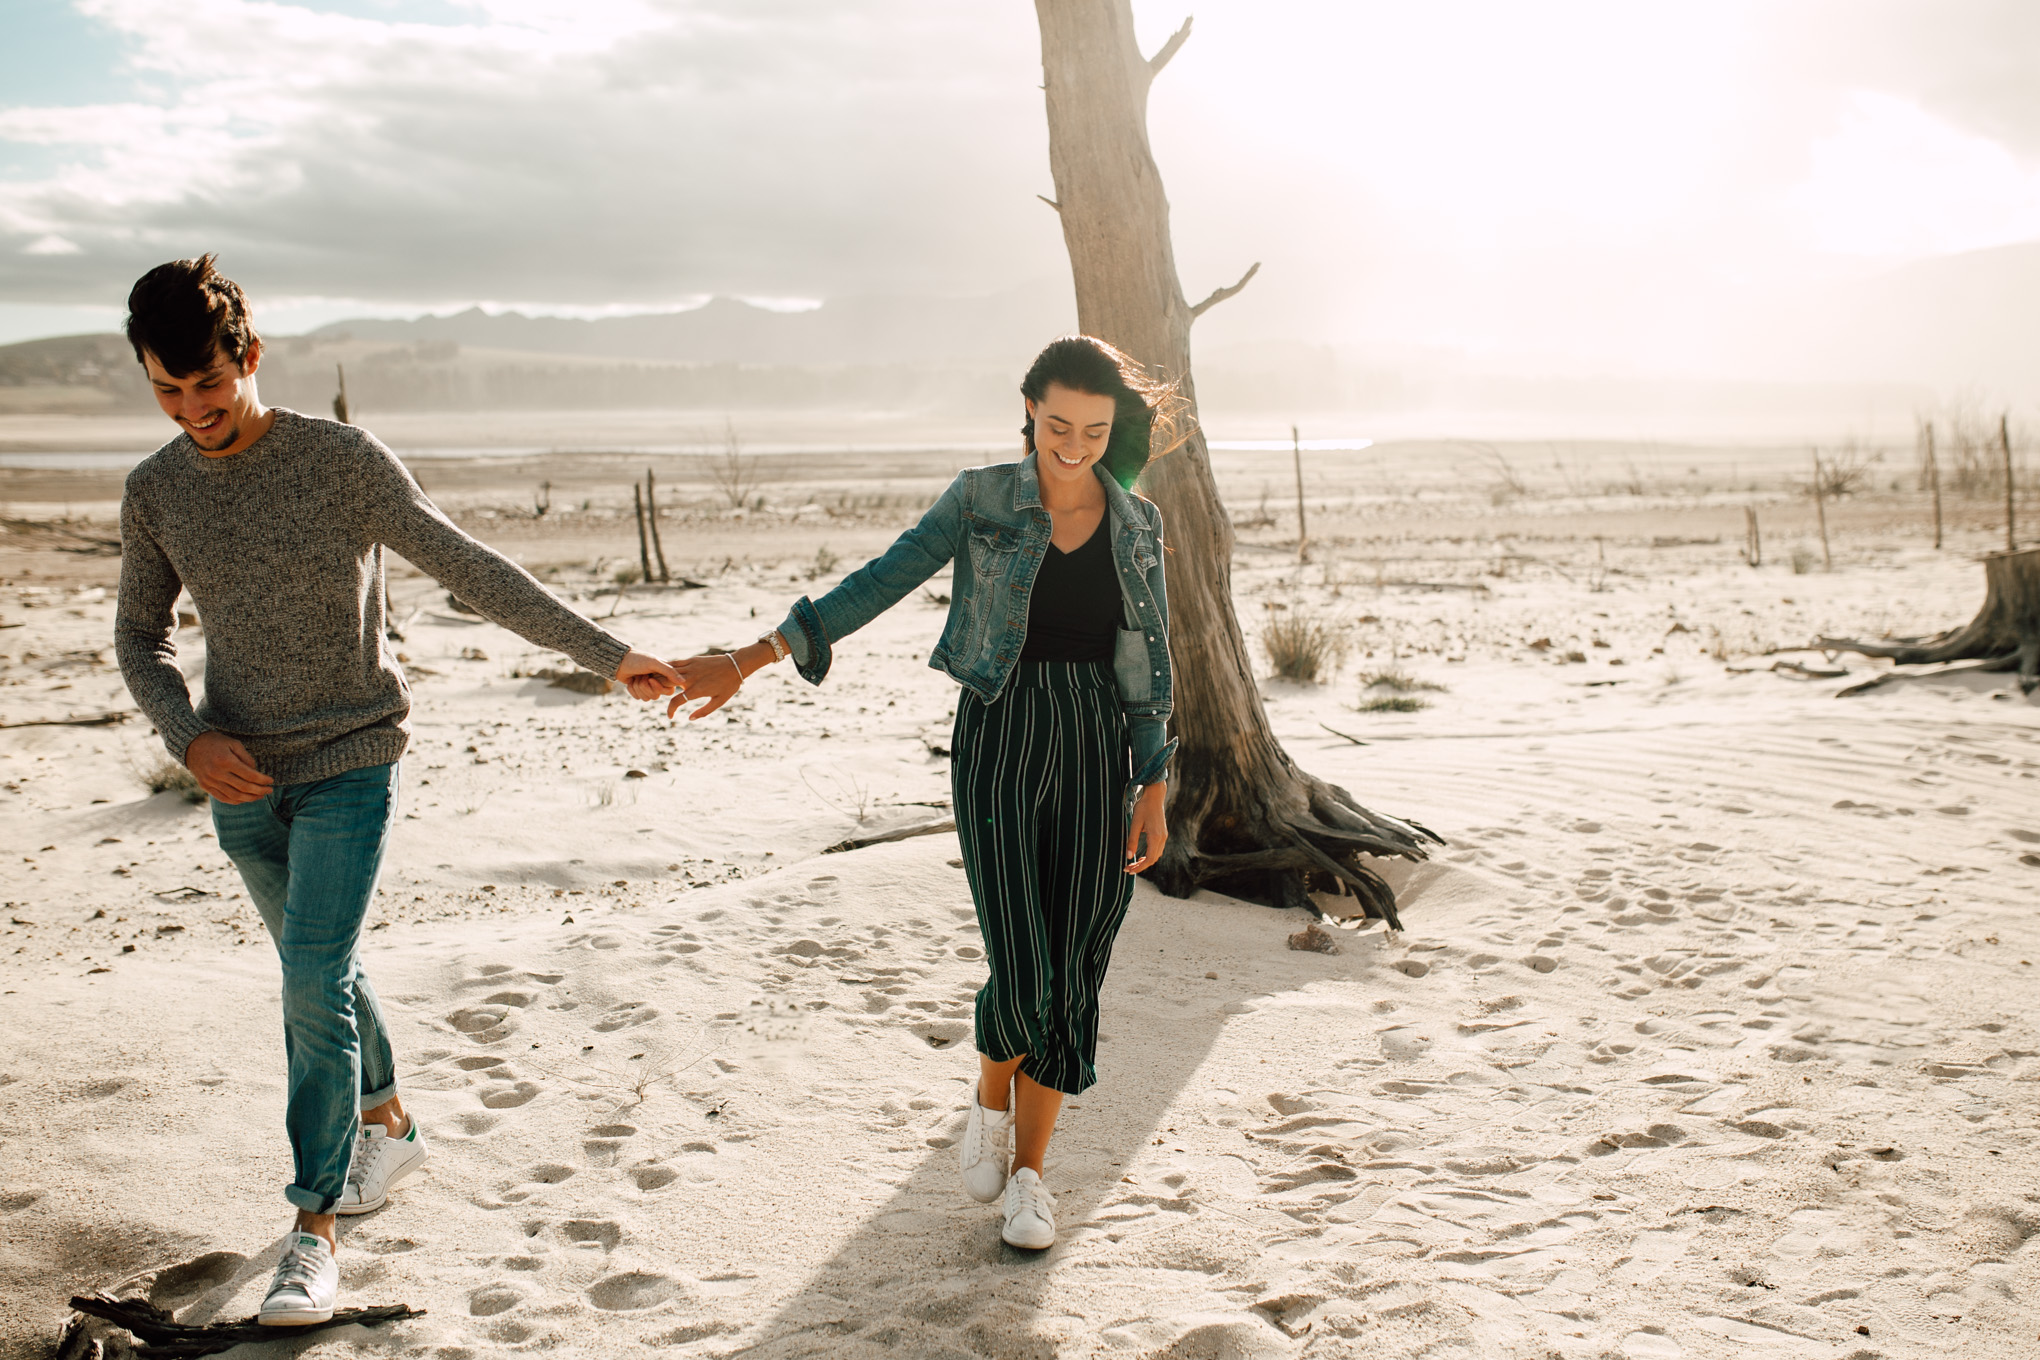 Cape-Town-Pia-Anna-Christian-Wedding-Photography-South-Africa-KF-41.jpg